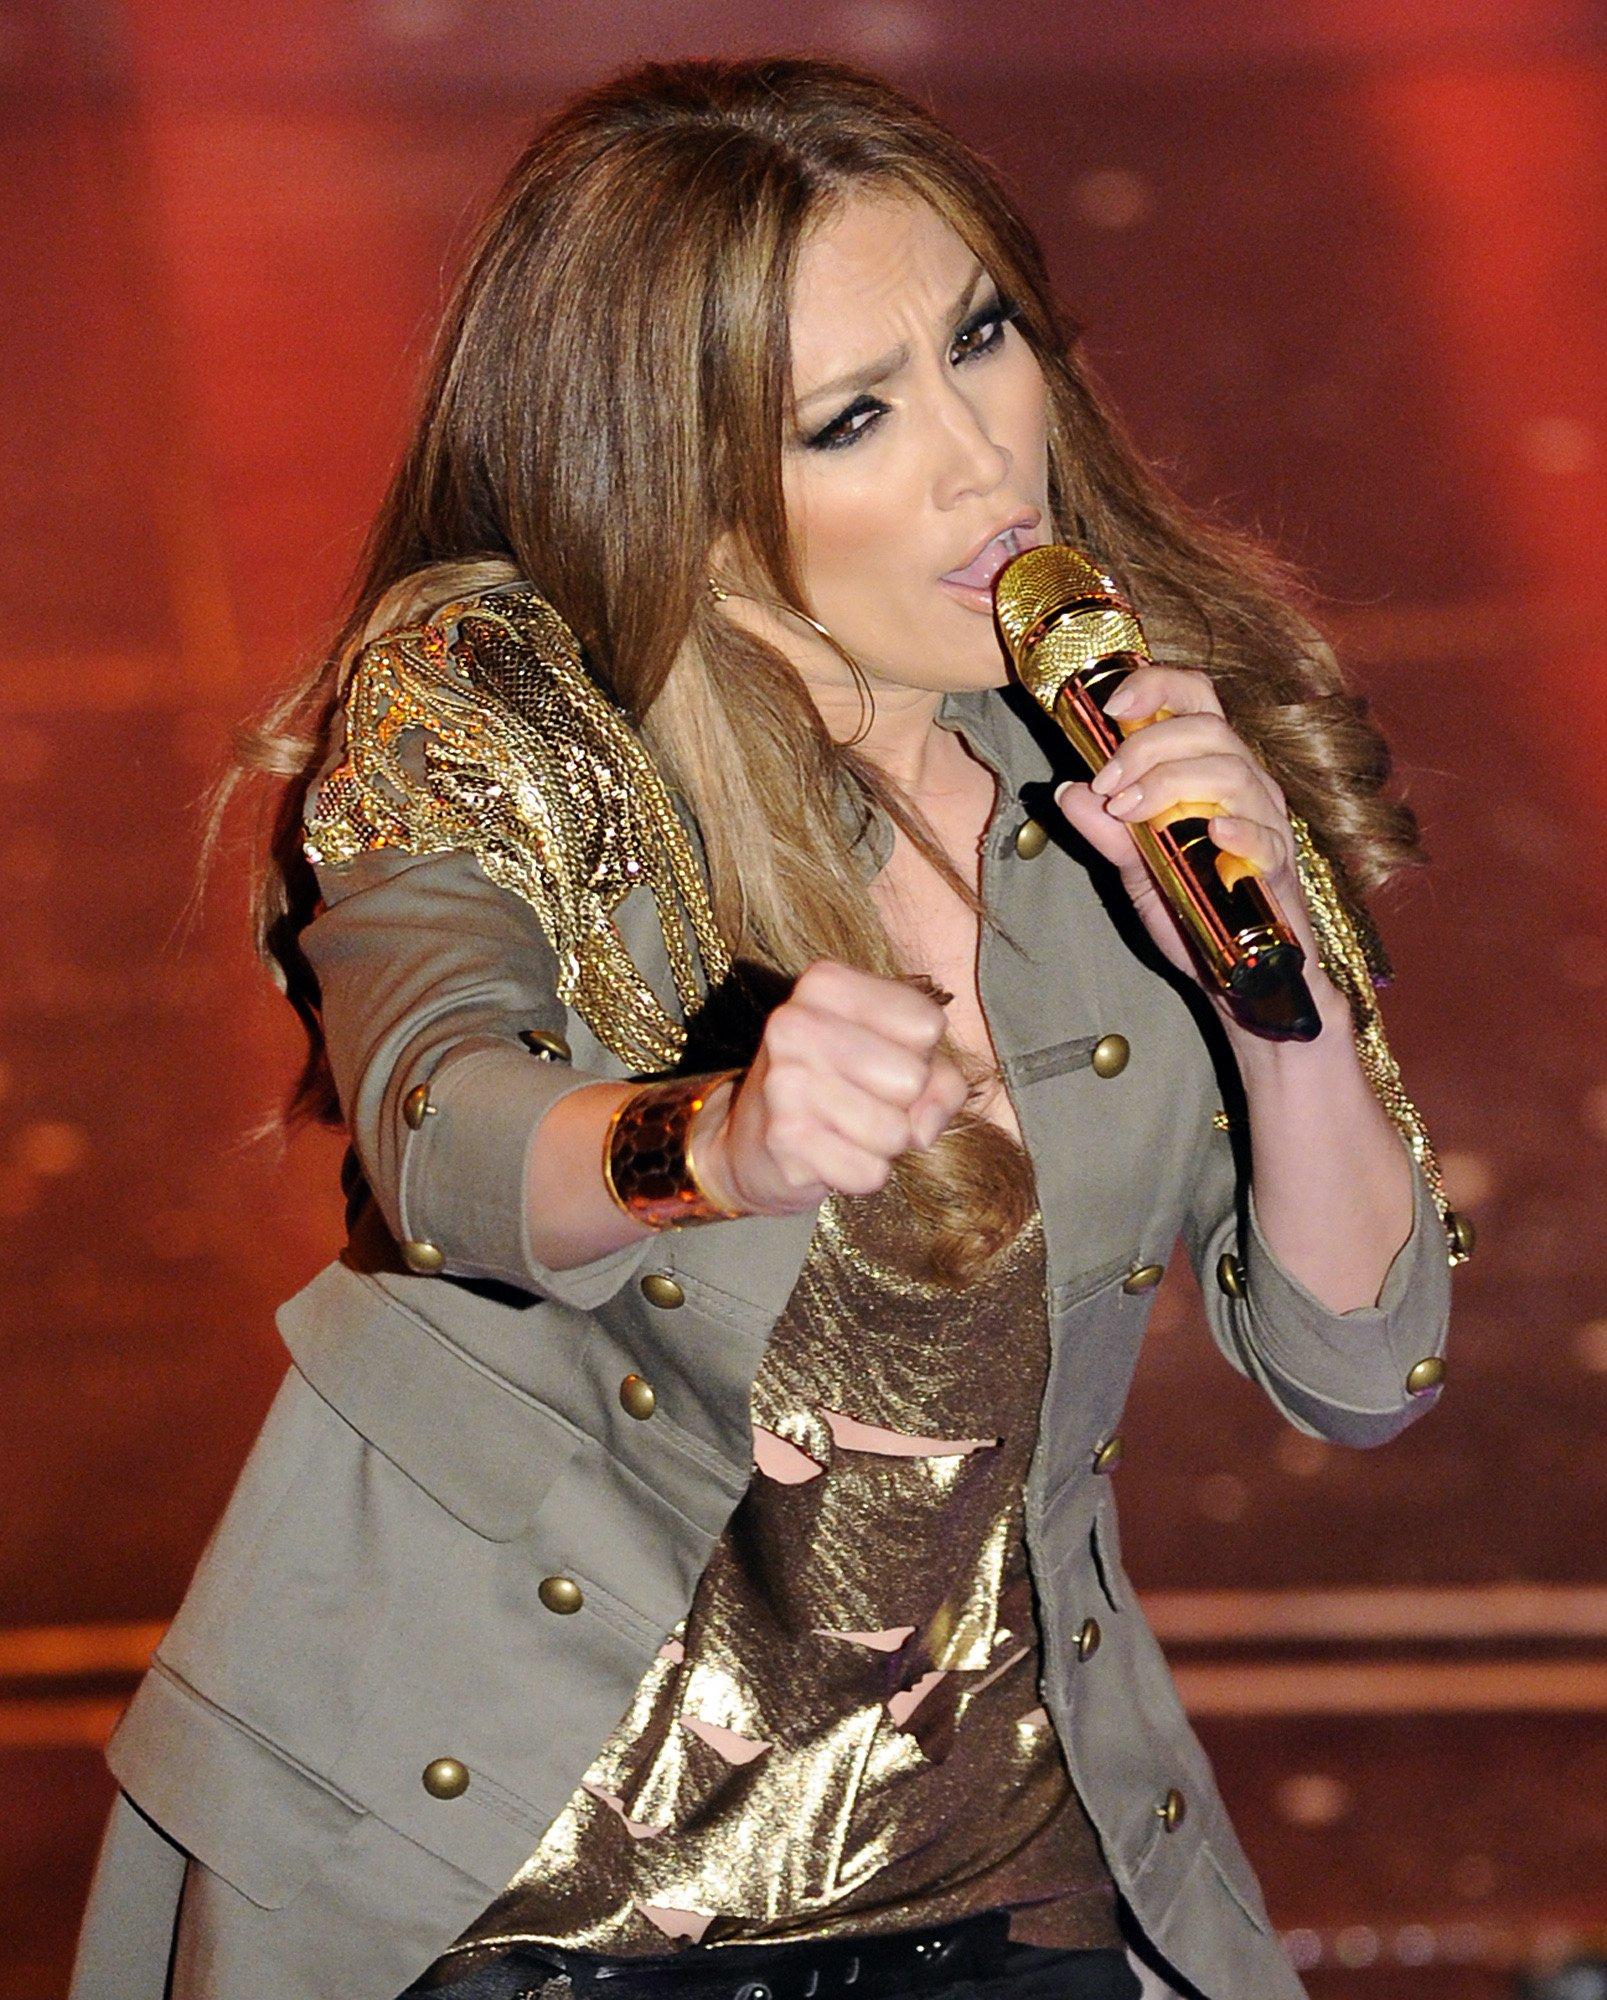 74392_Jennifer_Lopez_performs_during_the_Festival_di_Sanremo_Italian_song_contest-1_122_584lo.jpg